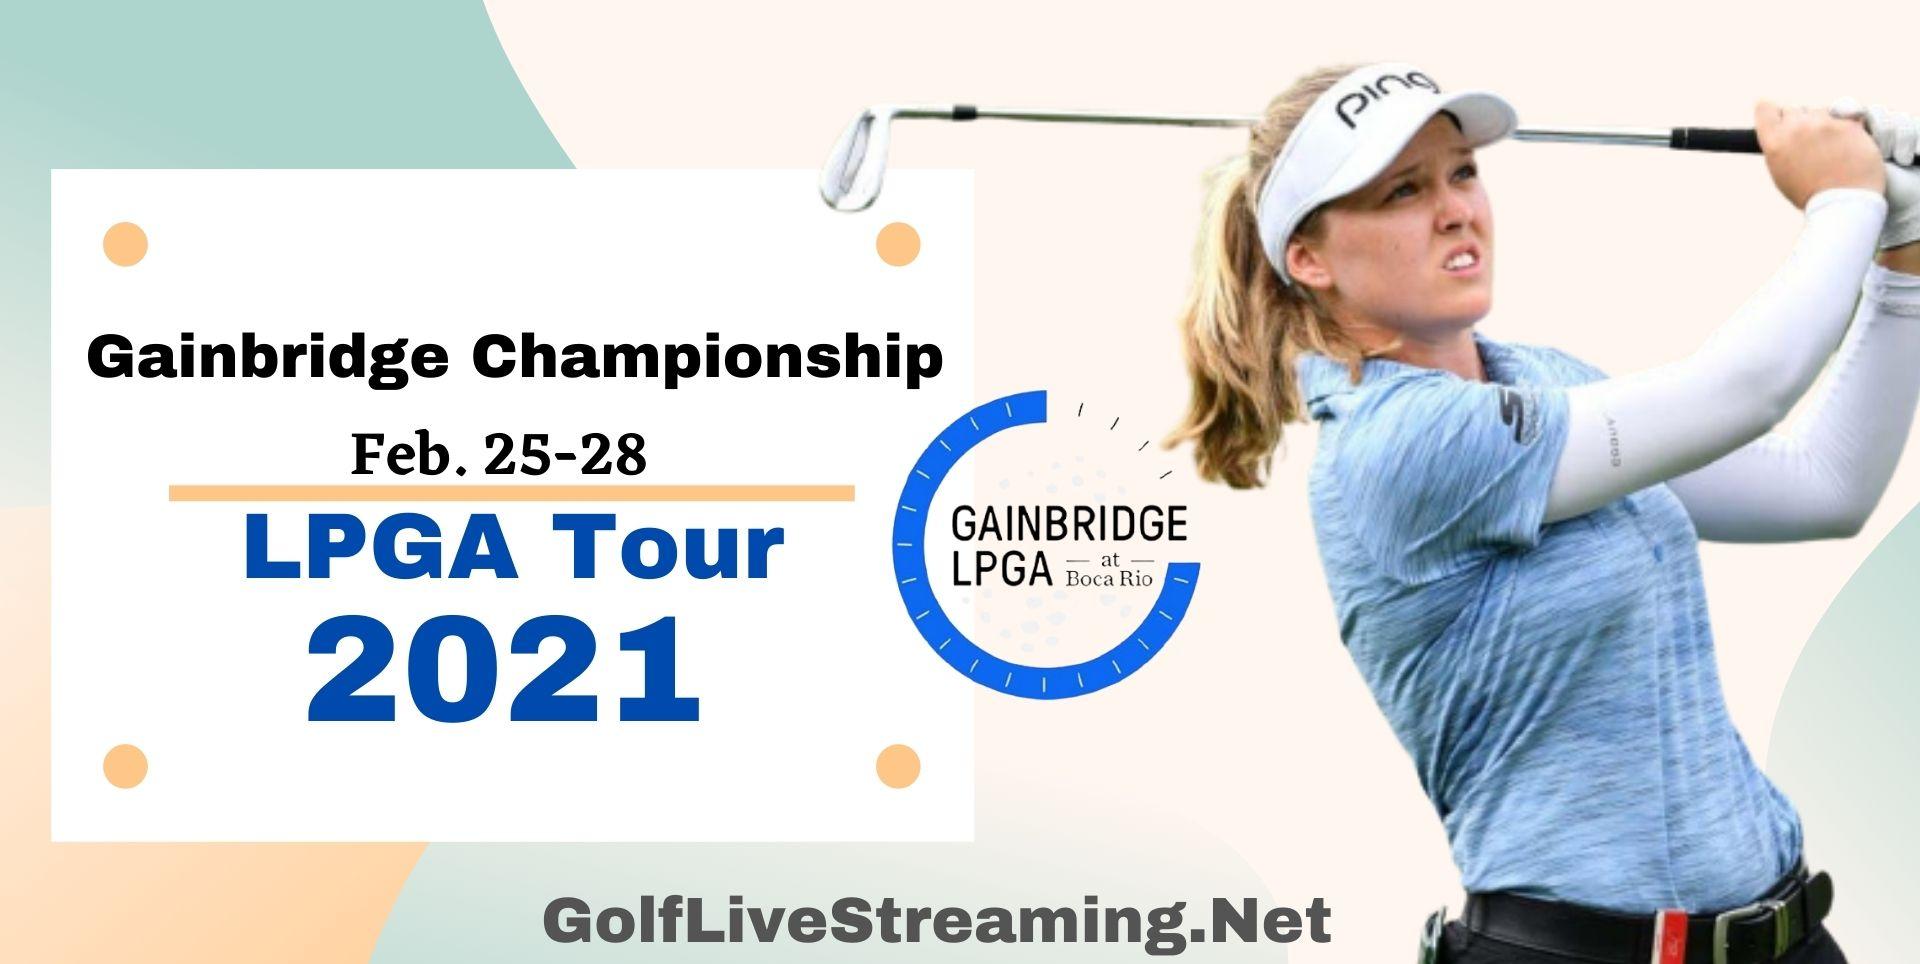 Gainbridge Championship LPGA Live Streaming